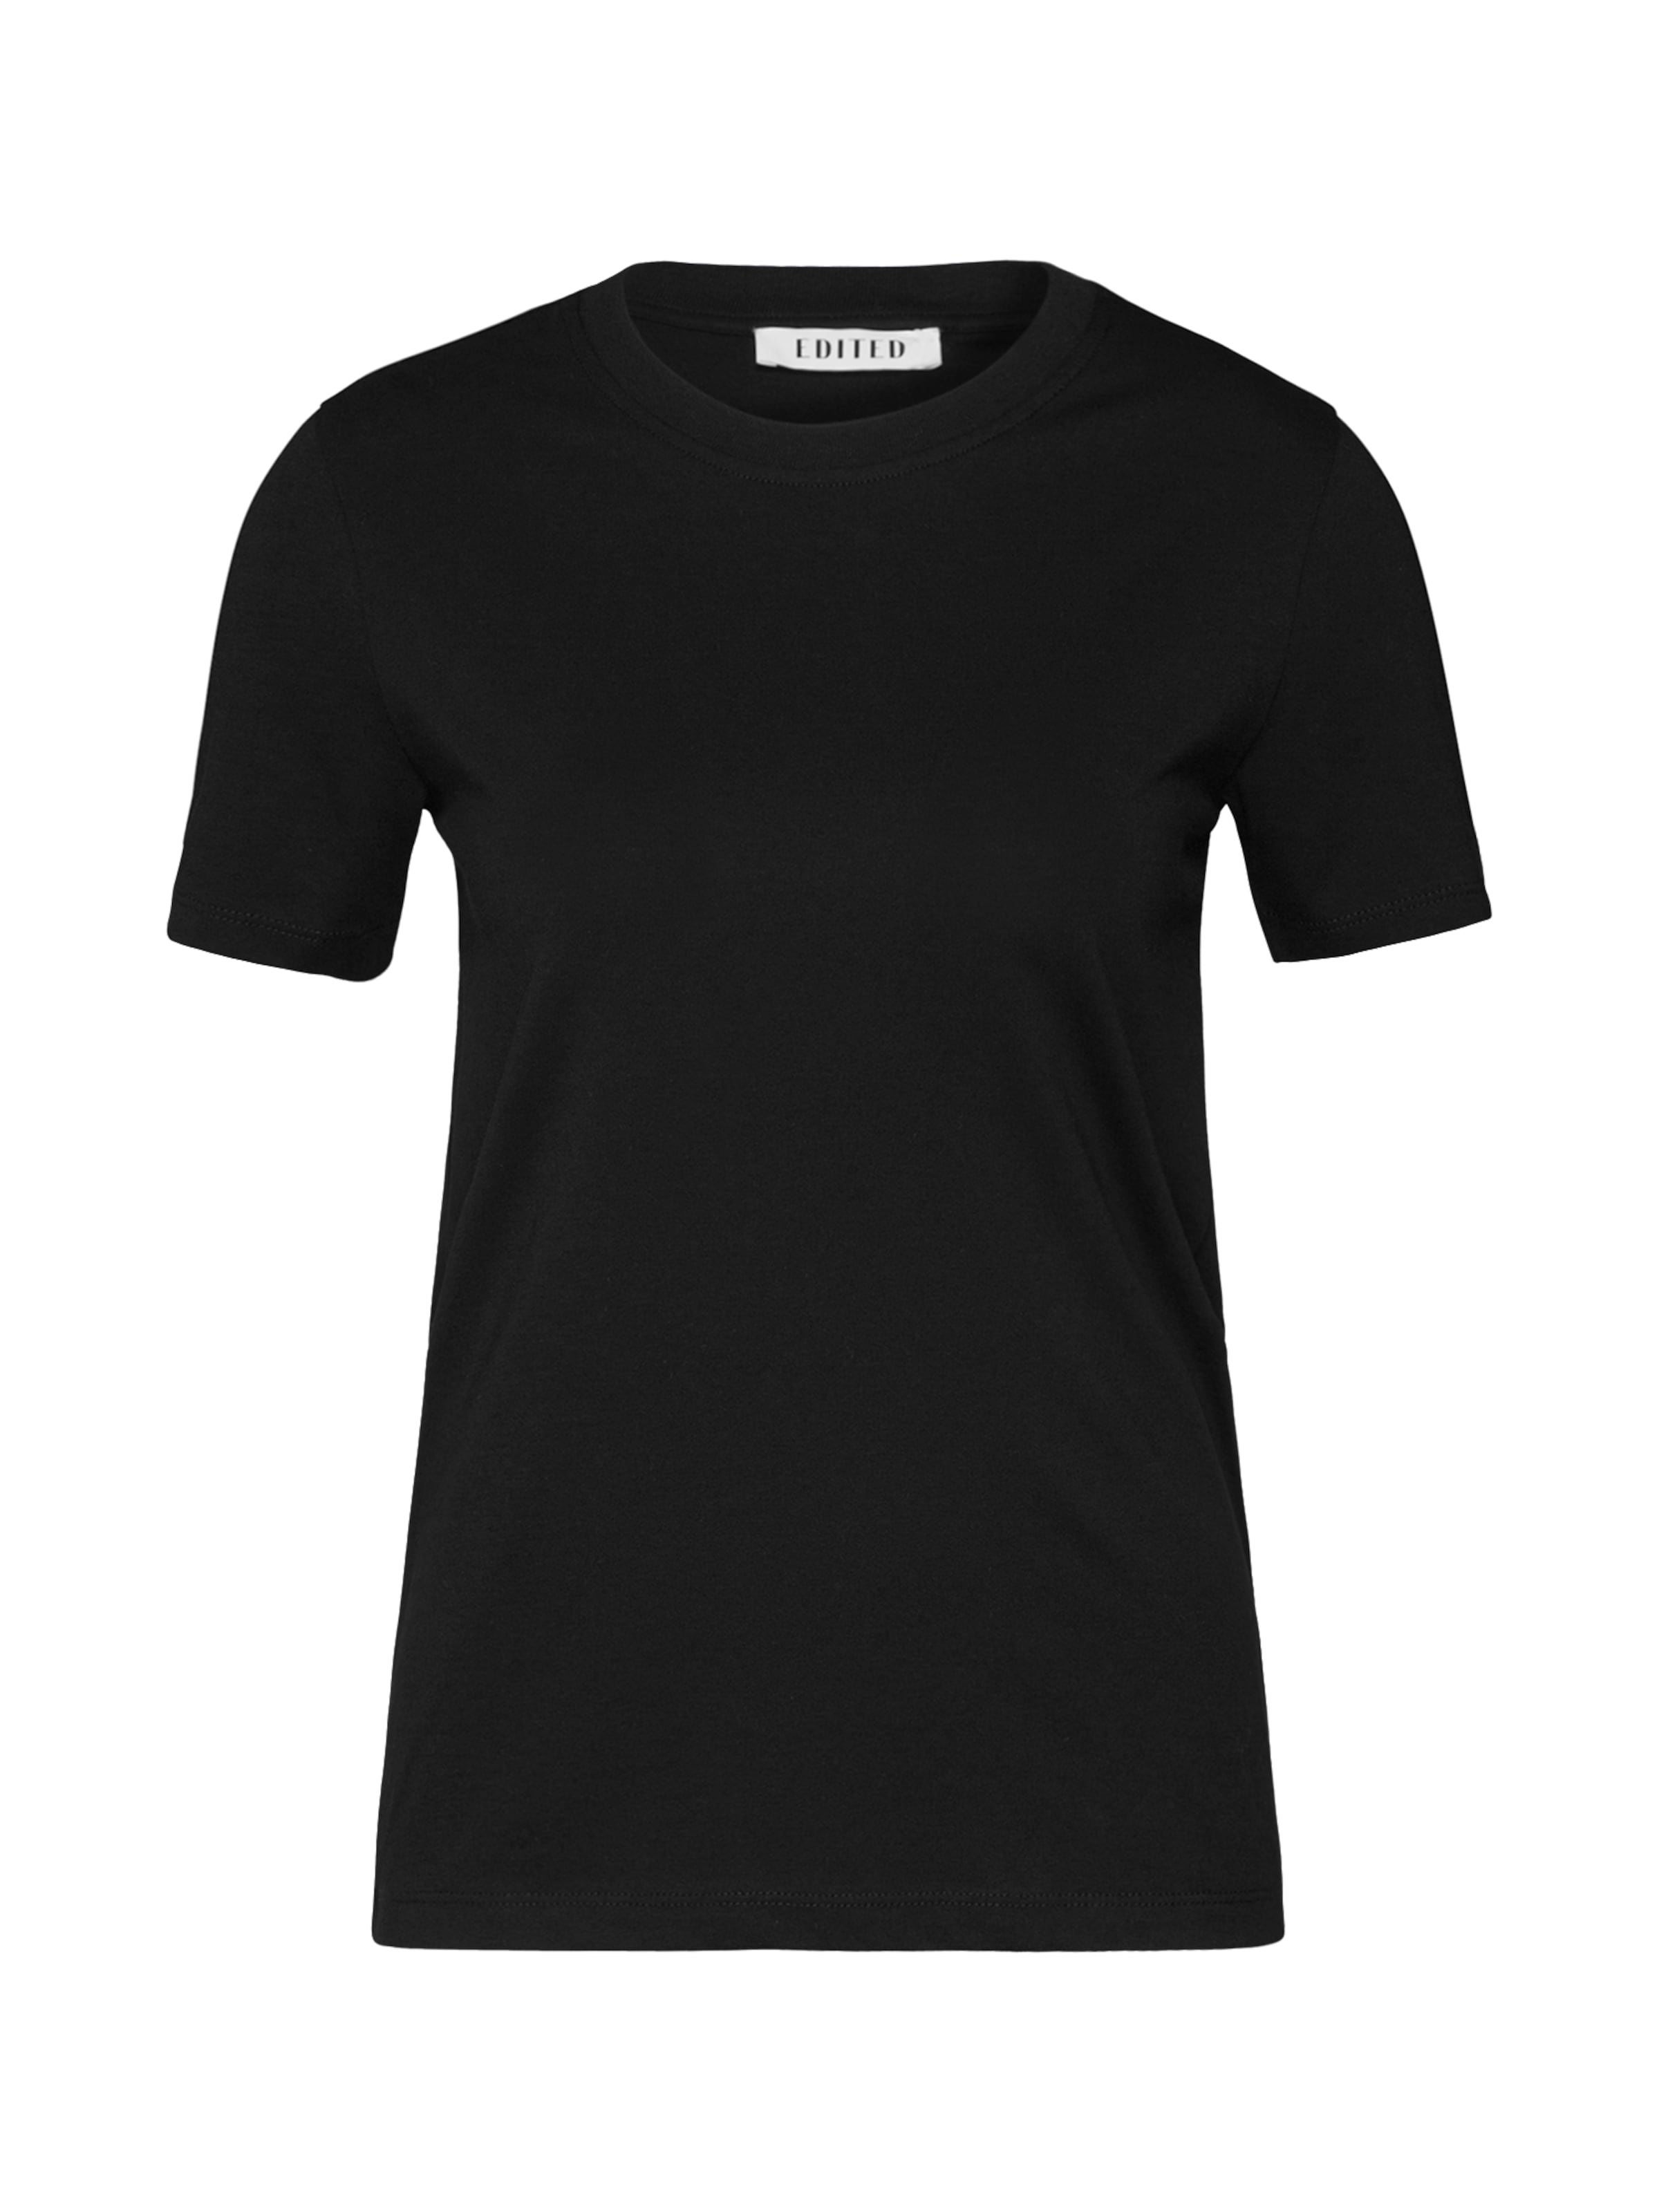 Noir En Edited shirt T 'leila' 6yg7Ybfv